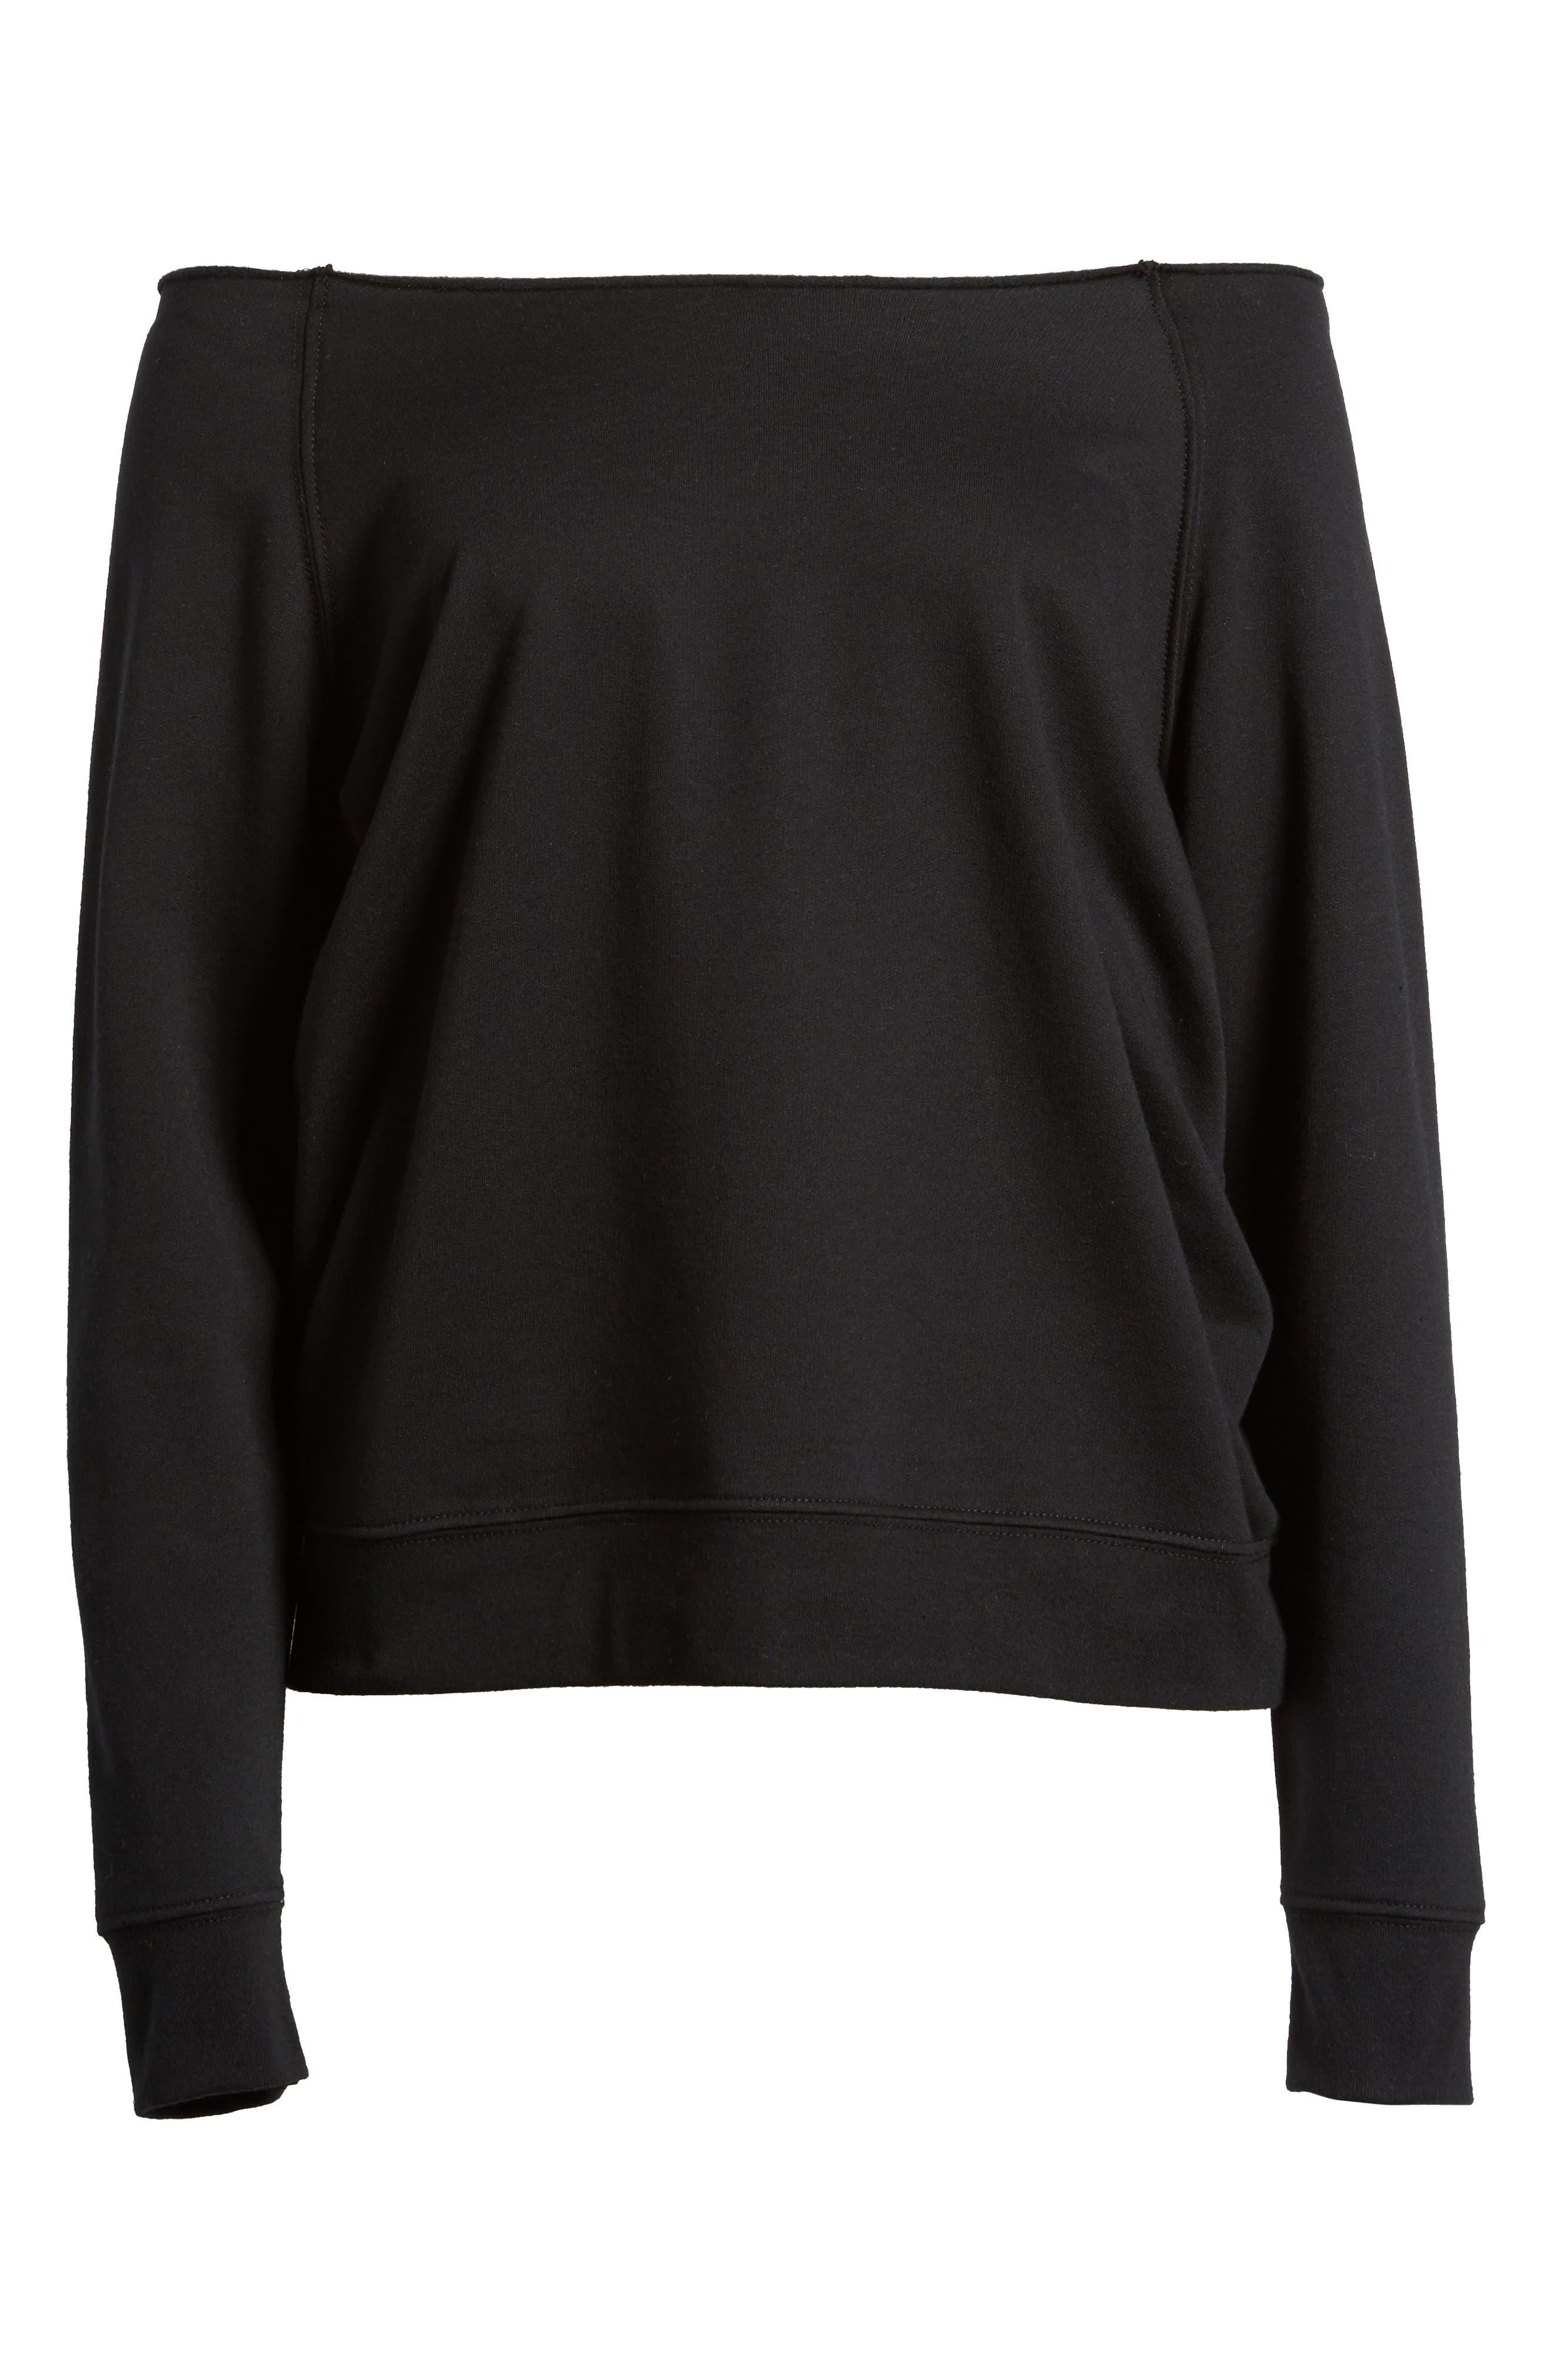 Raw Neck Sweatshirt,                             Alternate thumbnail 6, color,                             001